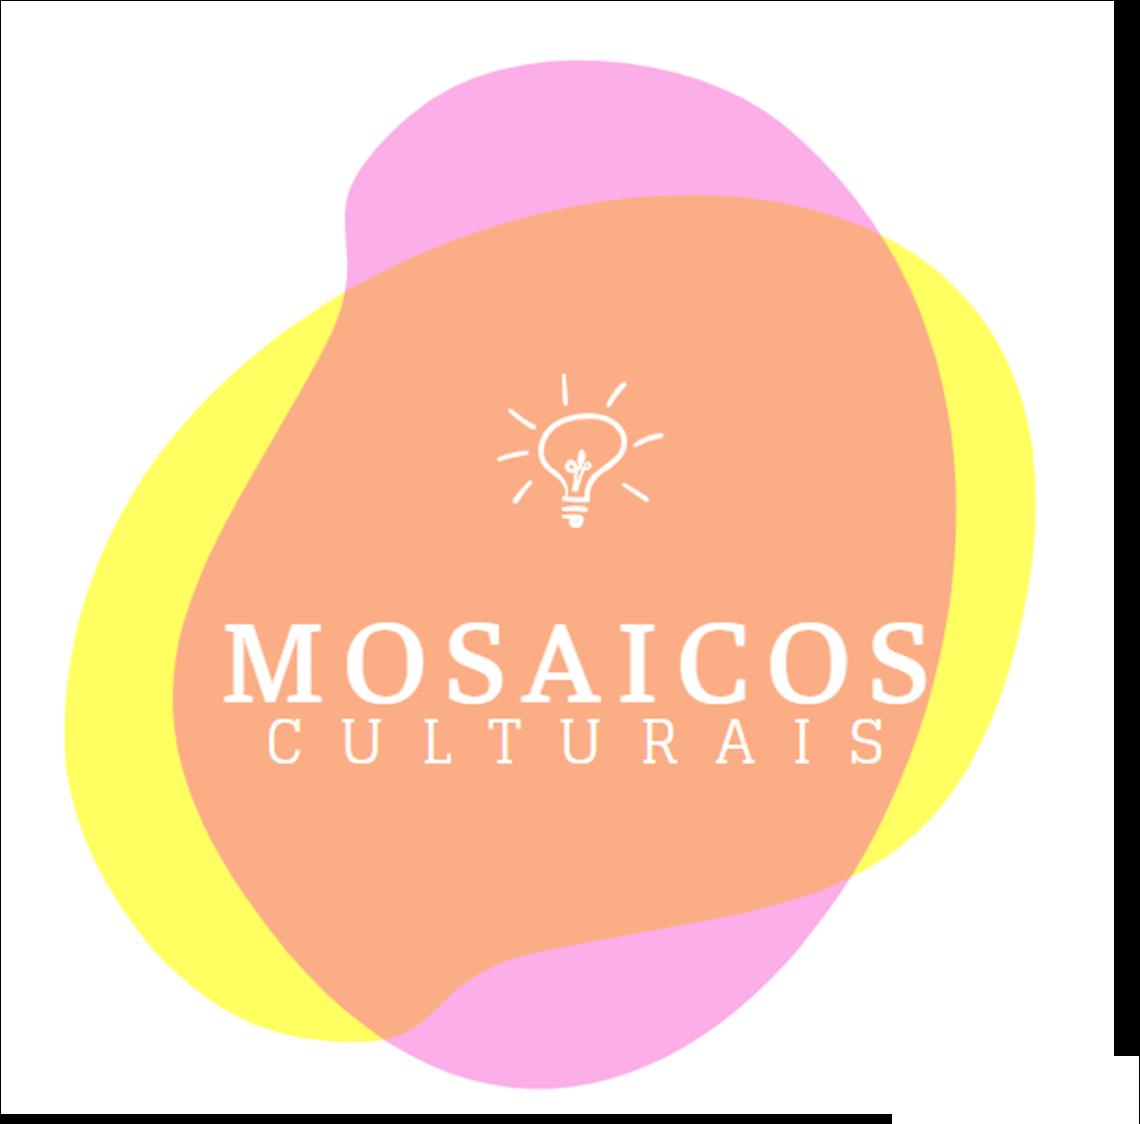 Mosaicos Culturais